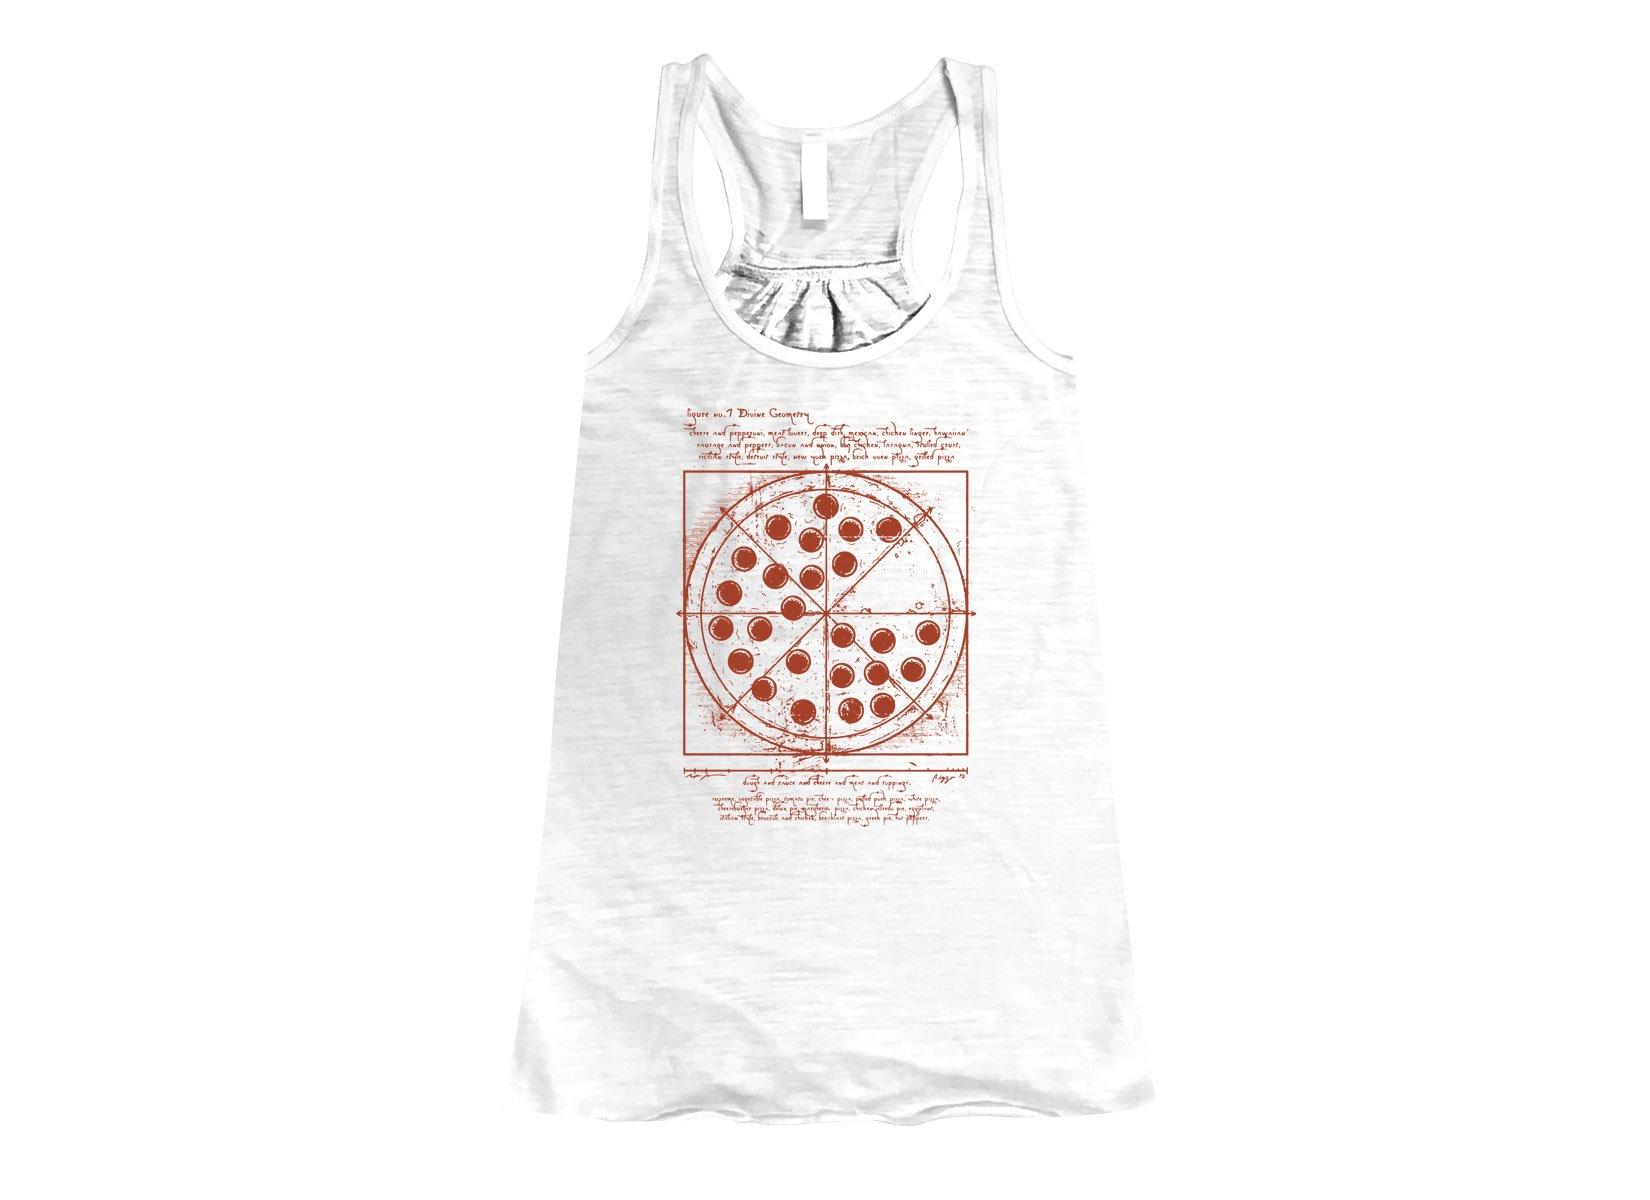 Vitruvian Pizza on Womens Tanks T-Shirt